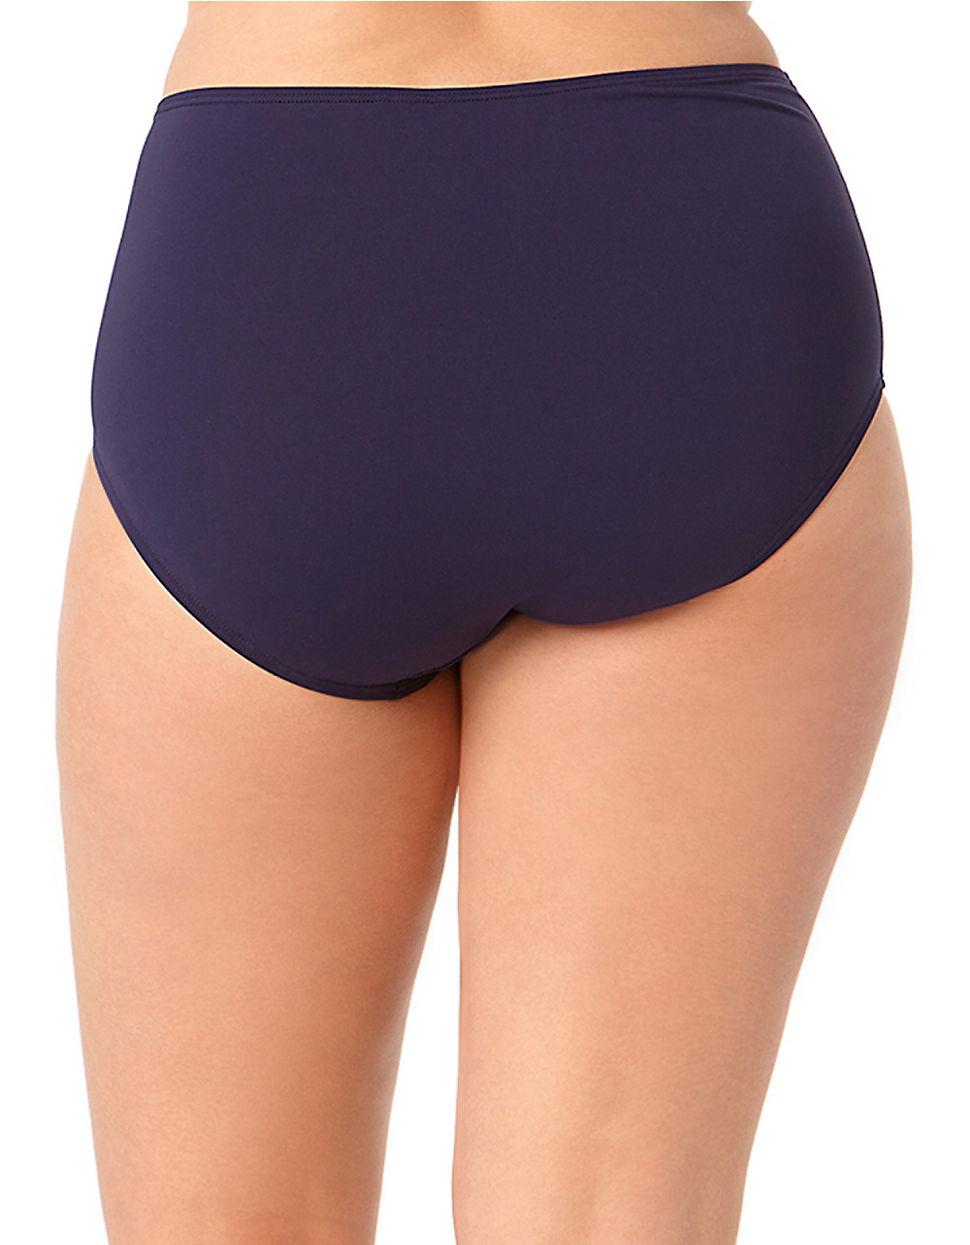 617f7937f4118 Anne Cole High-Waisted Tummy Control Bikini Bottoms in Blue - Lyst